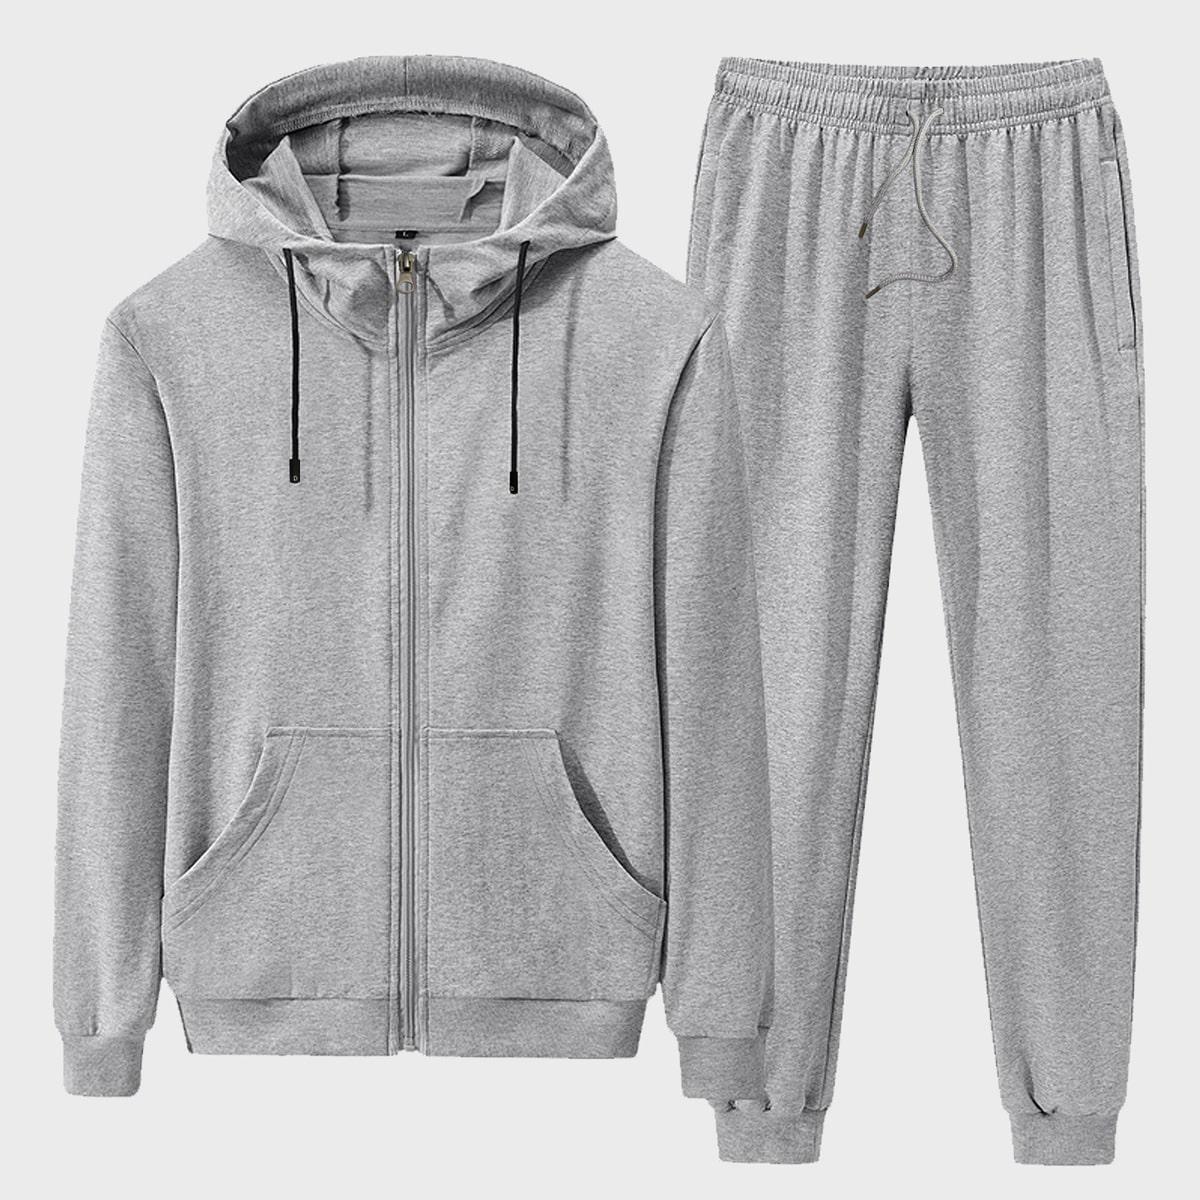 Men Zip Up Drawstring Hoodie & Sweatpants, SHEIN  - buy with discount